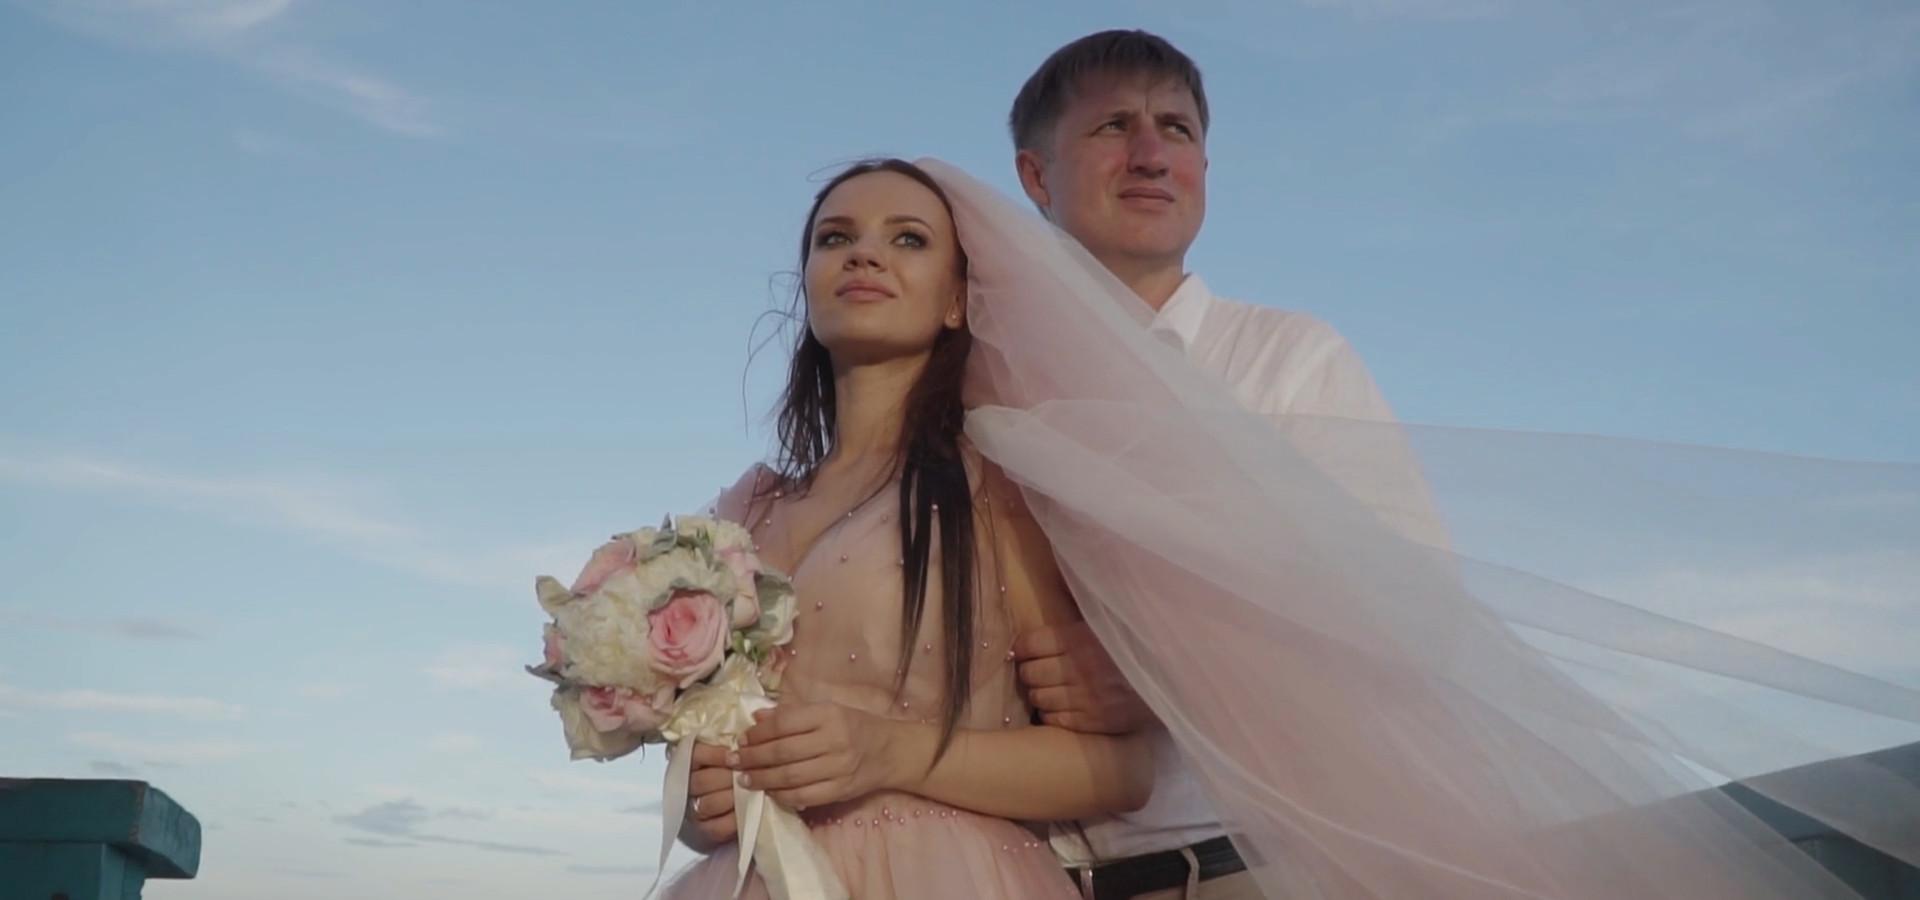 ETERNITY Wedding.mp4